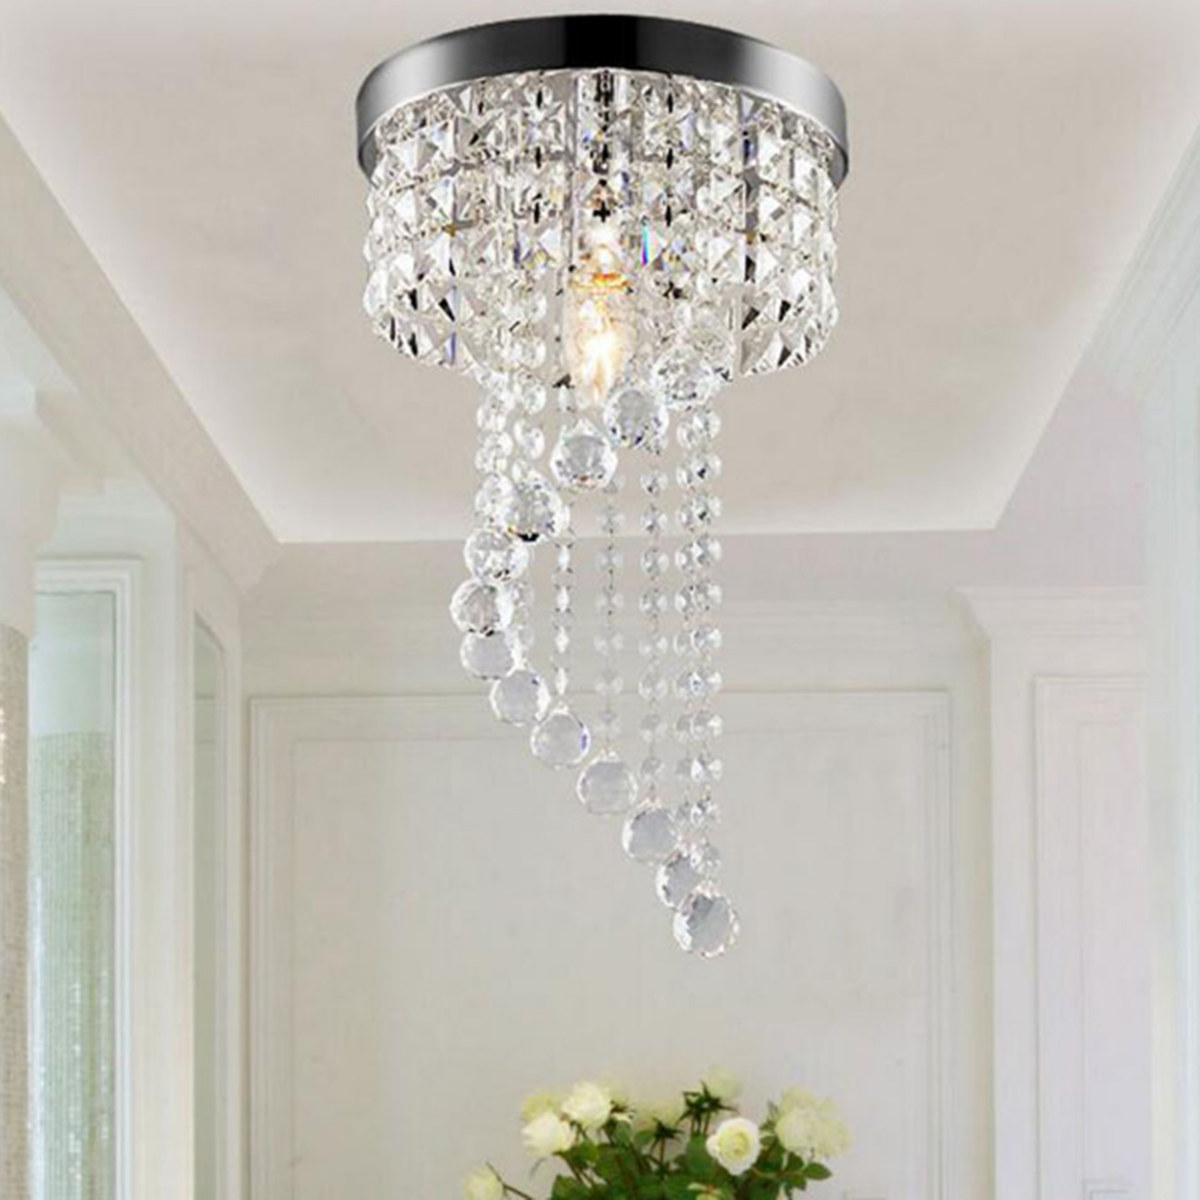 Modern led galaxy spiral crystal chandelier lamp fixture lighting pendant decor 220v